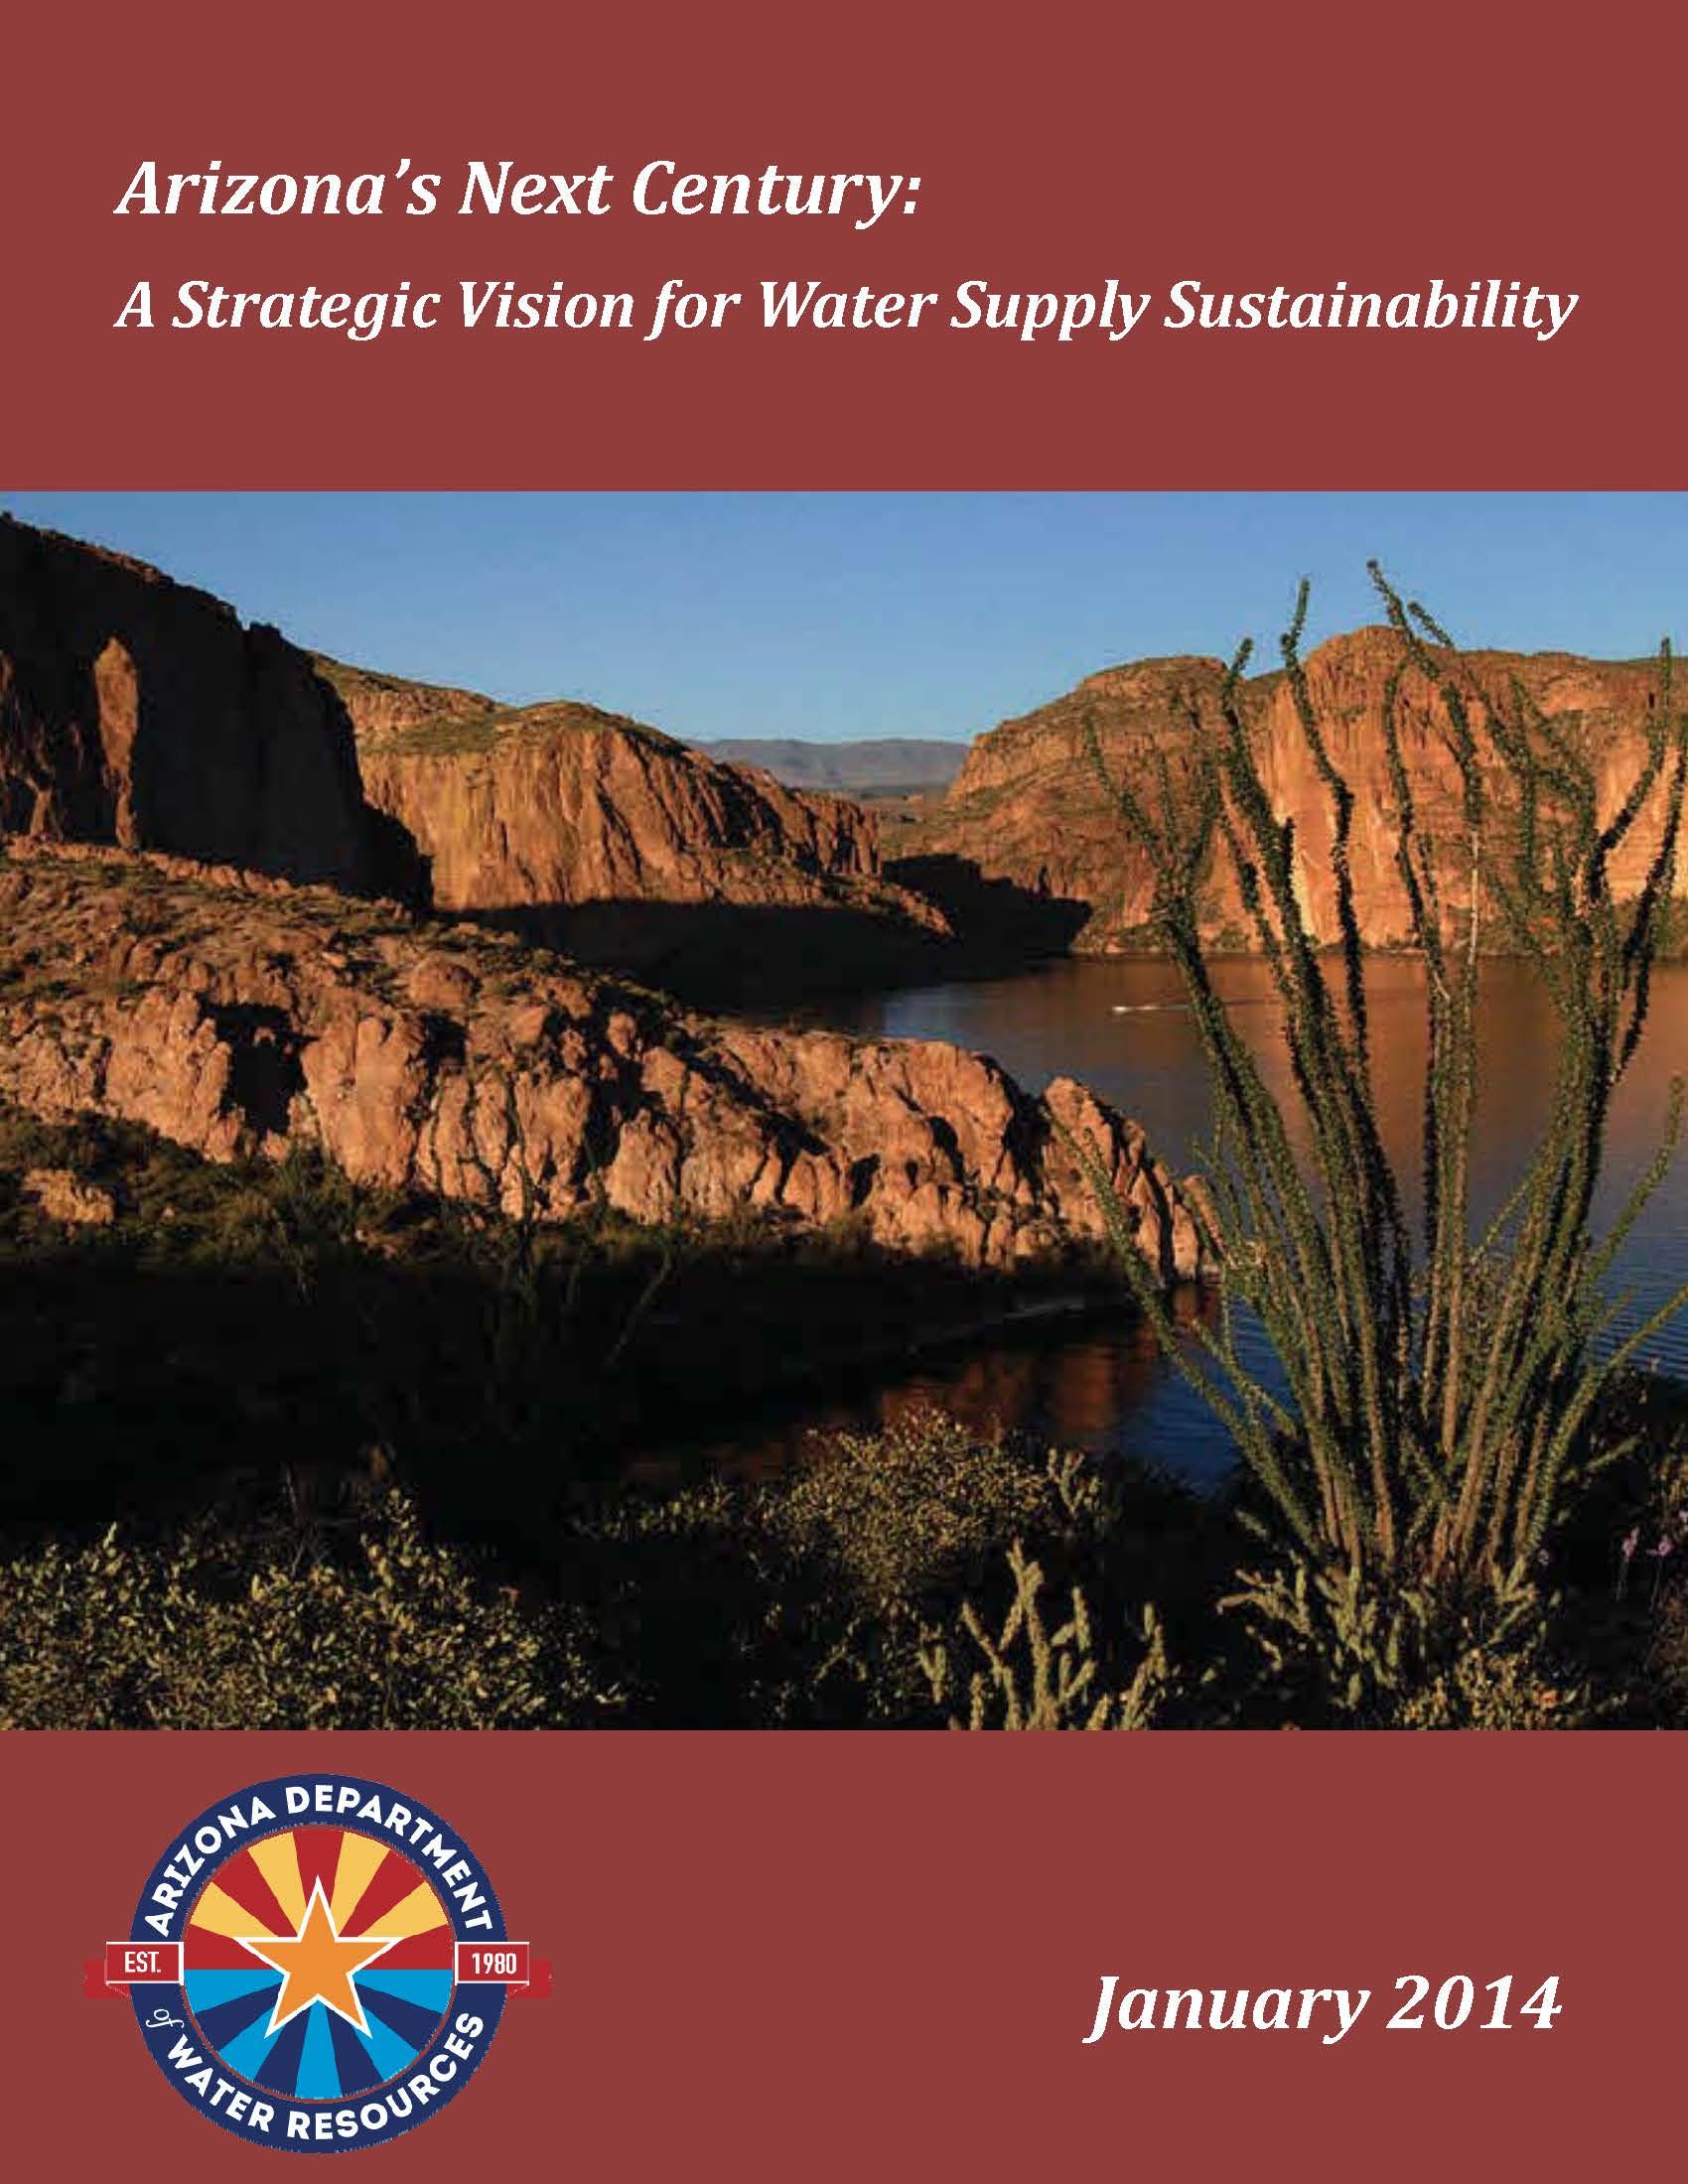 ADWR Strategic Vision